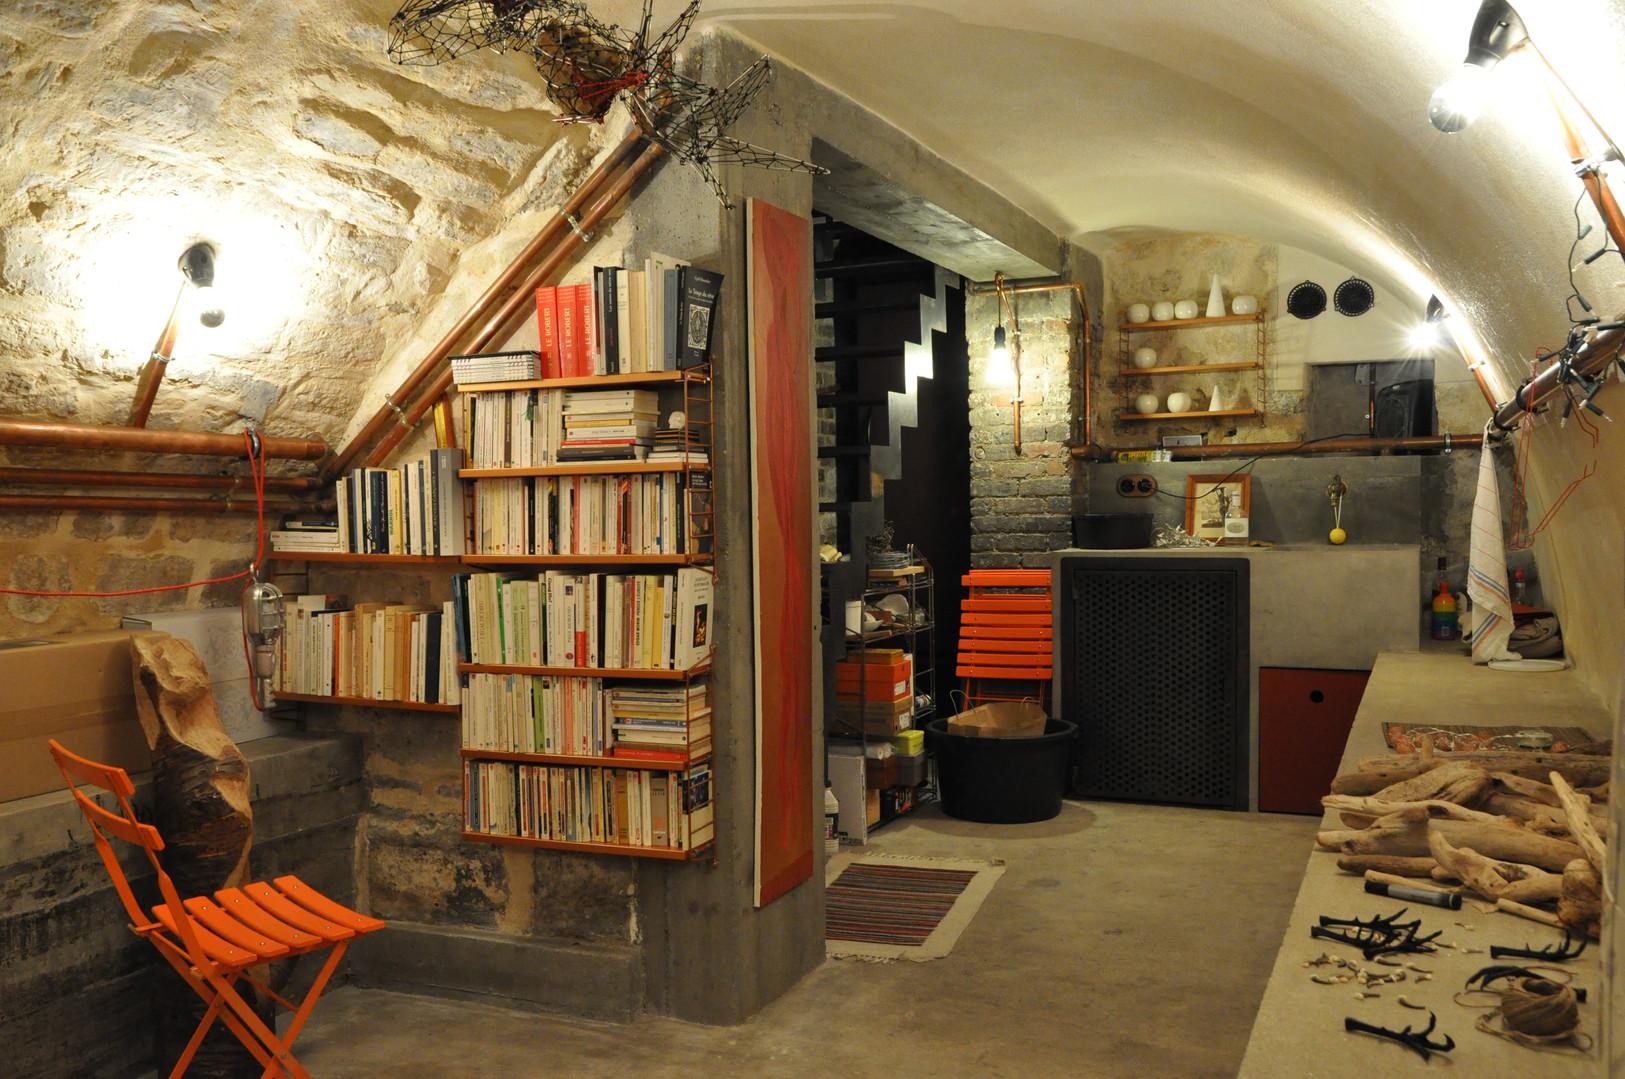 Aménagement de caves en atelier d'artist